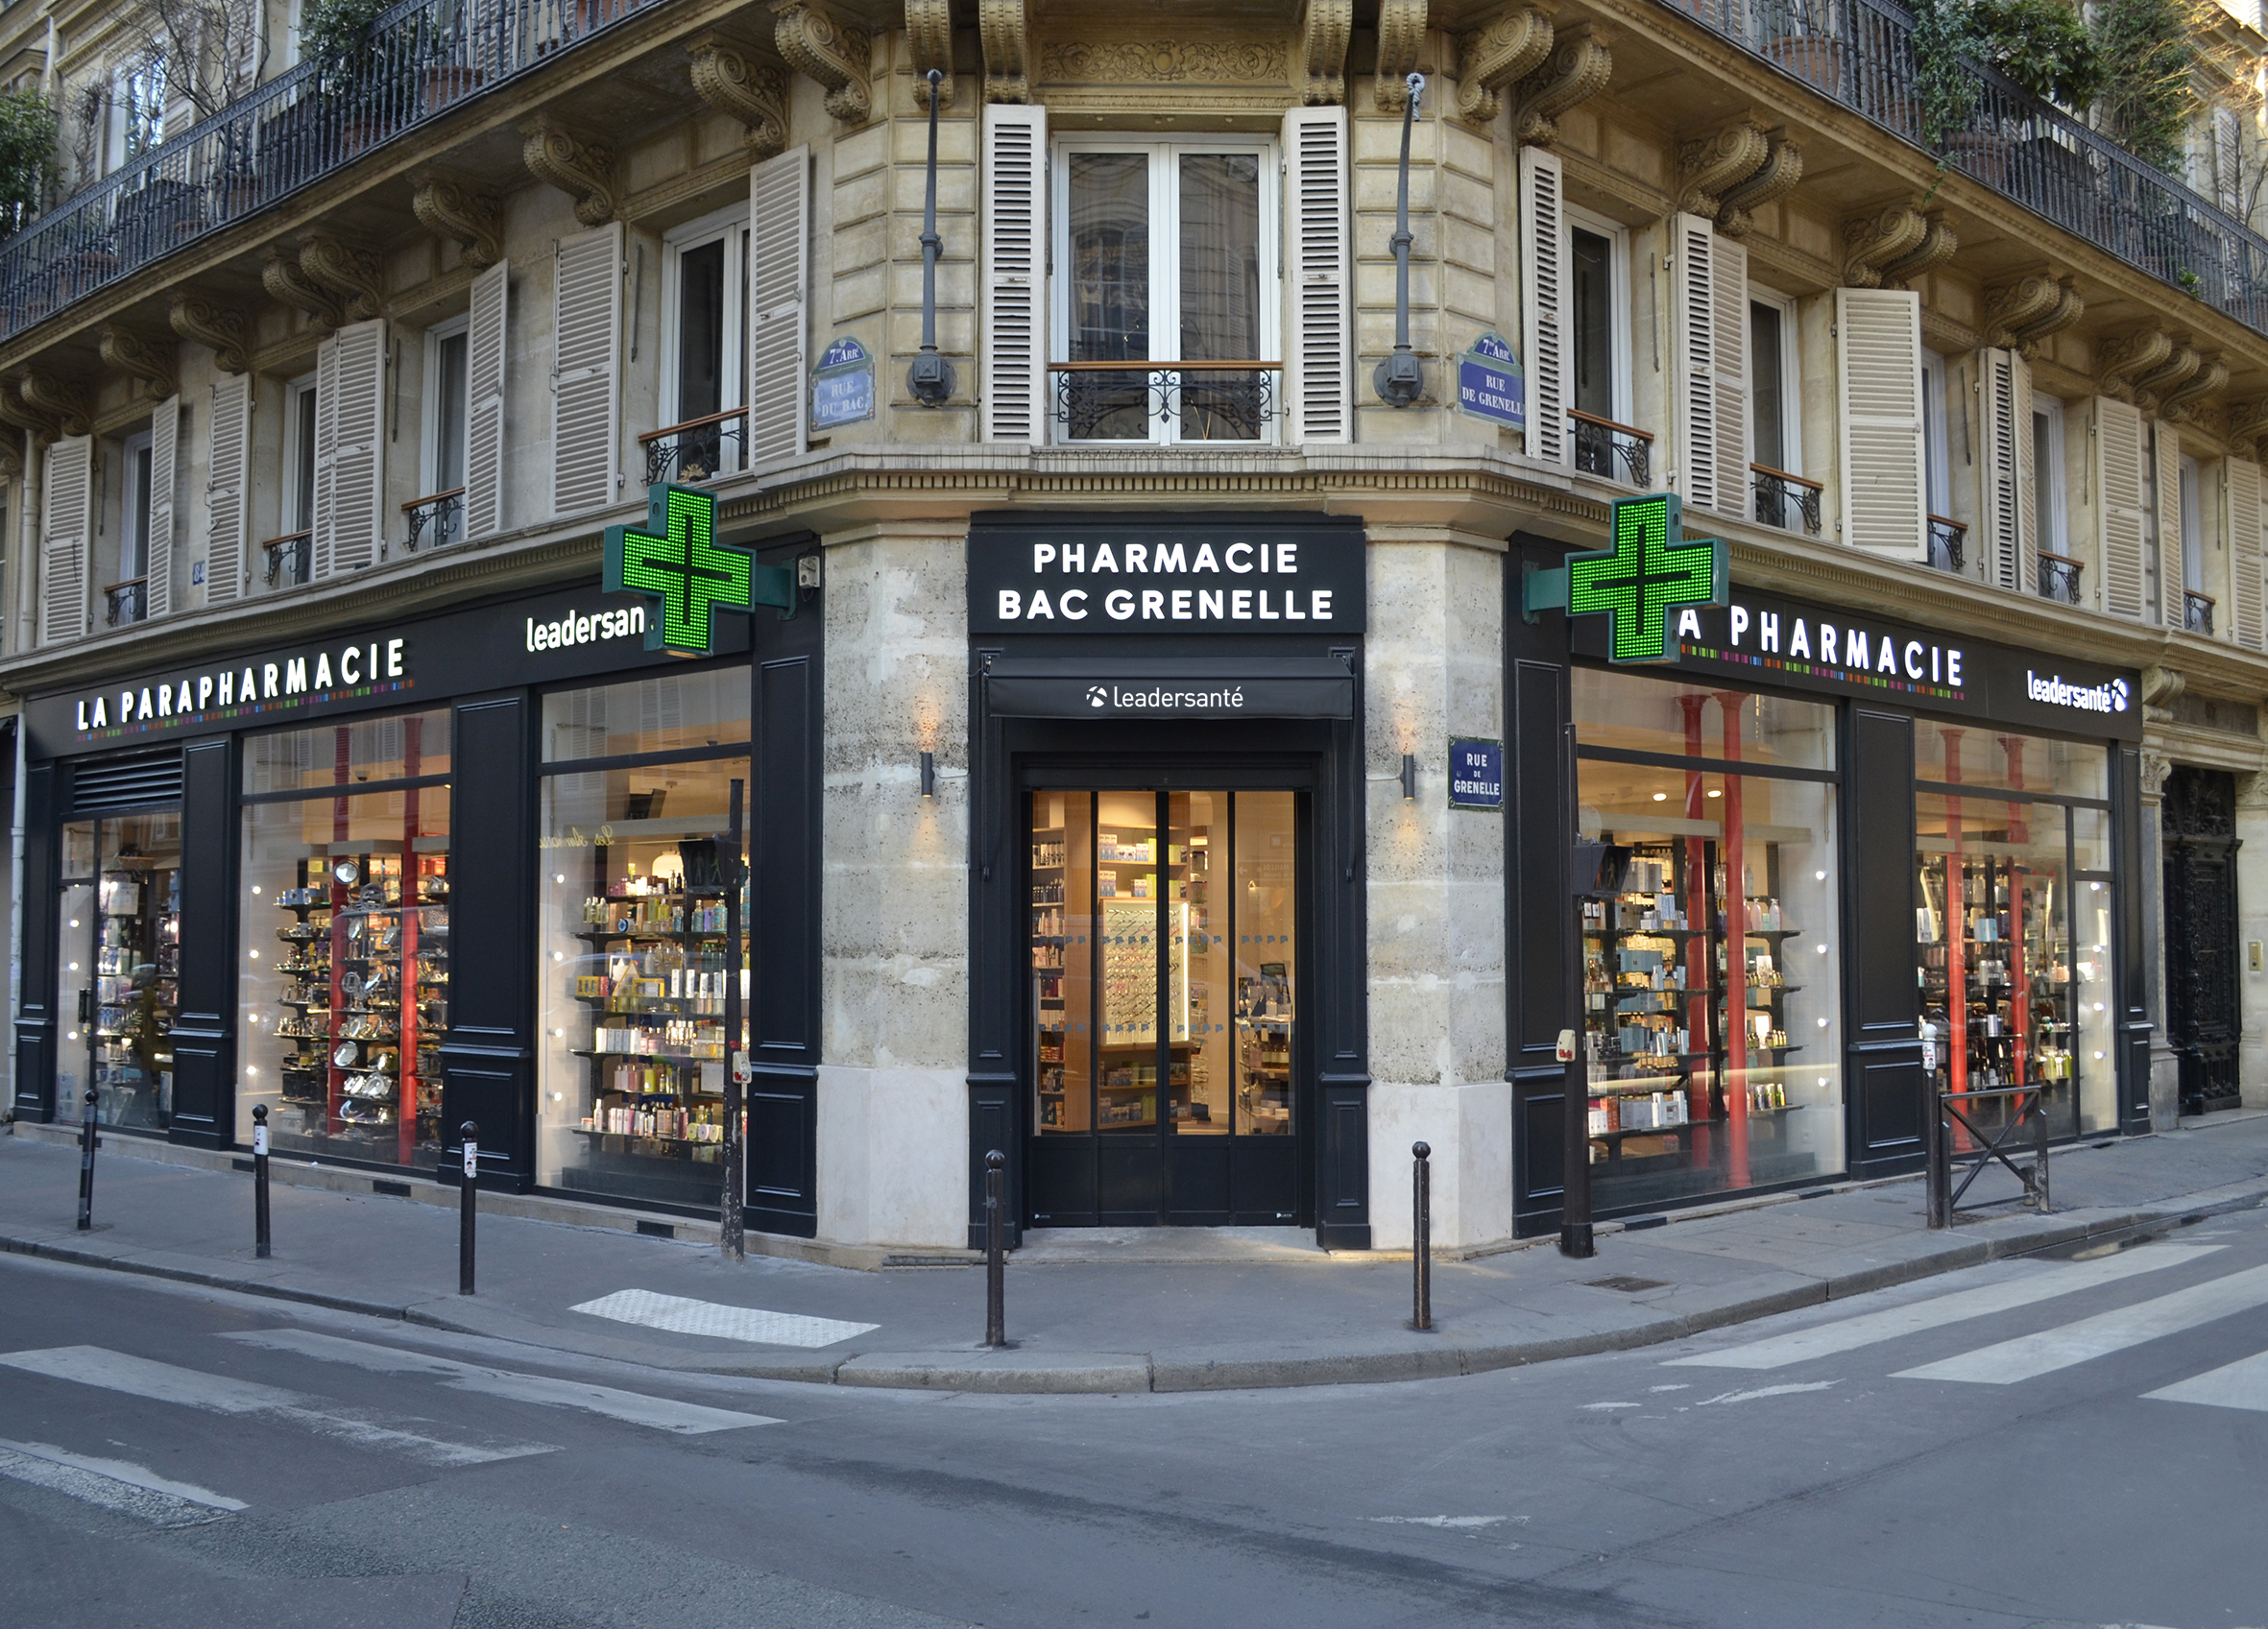 Pharmacie bac grenelle